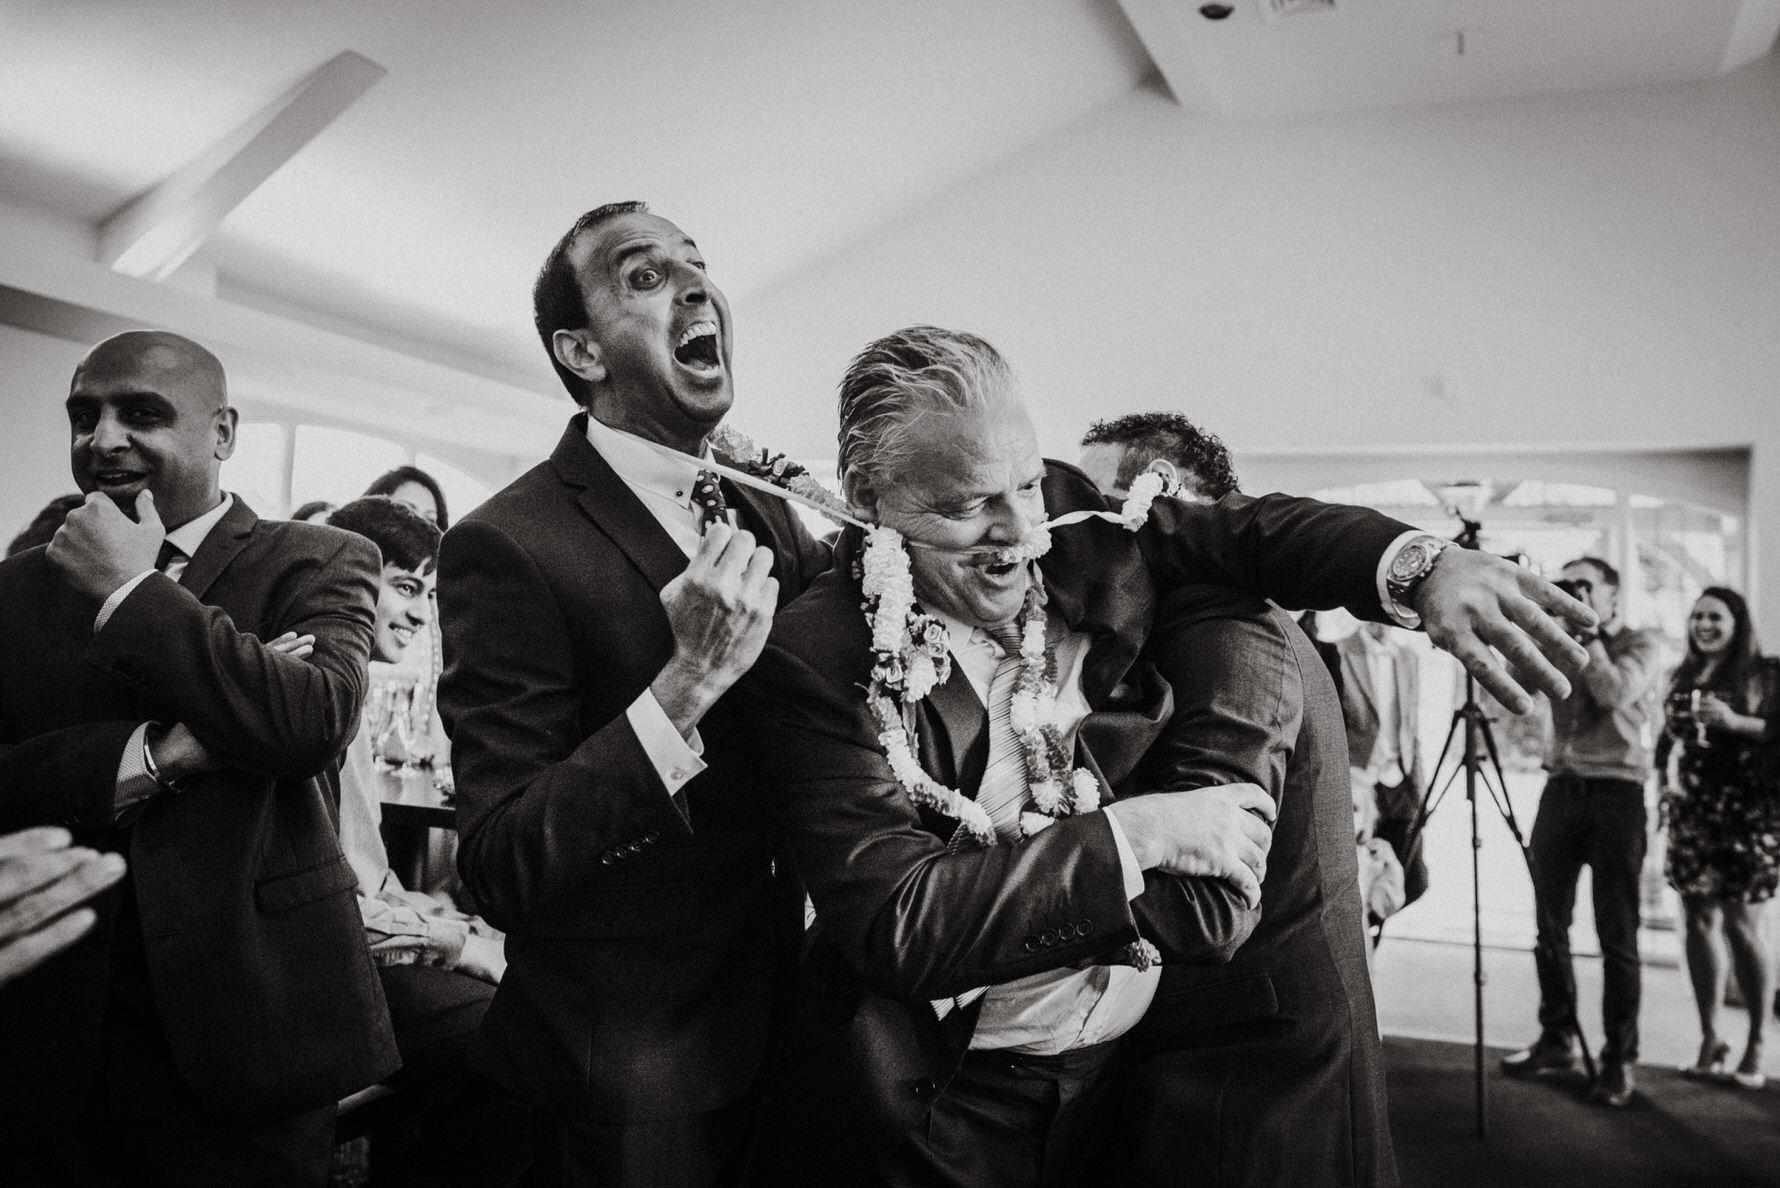 Cheshire Documentary Wedding Photography at Colshaw Hall